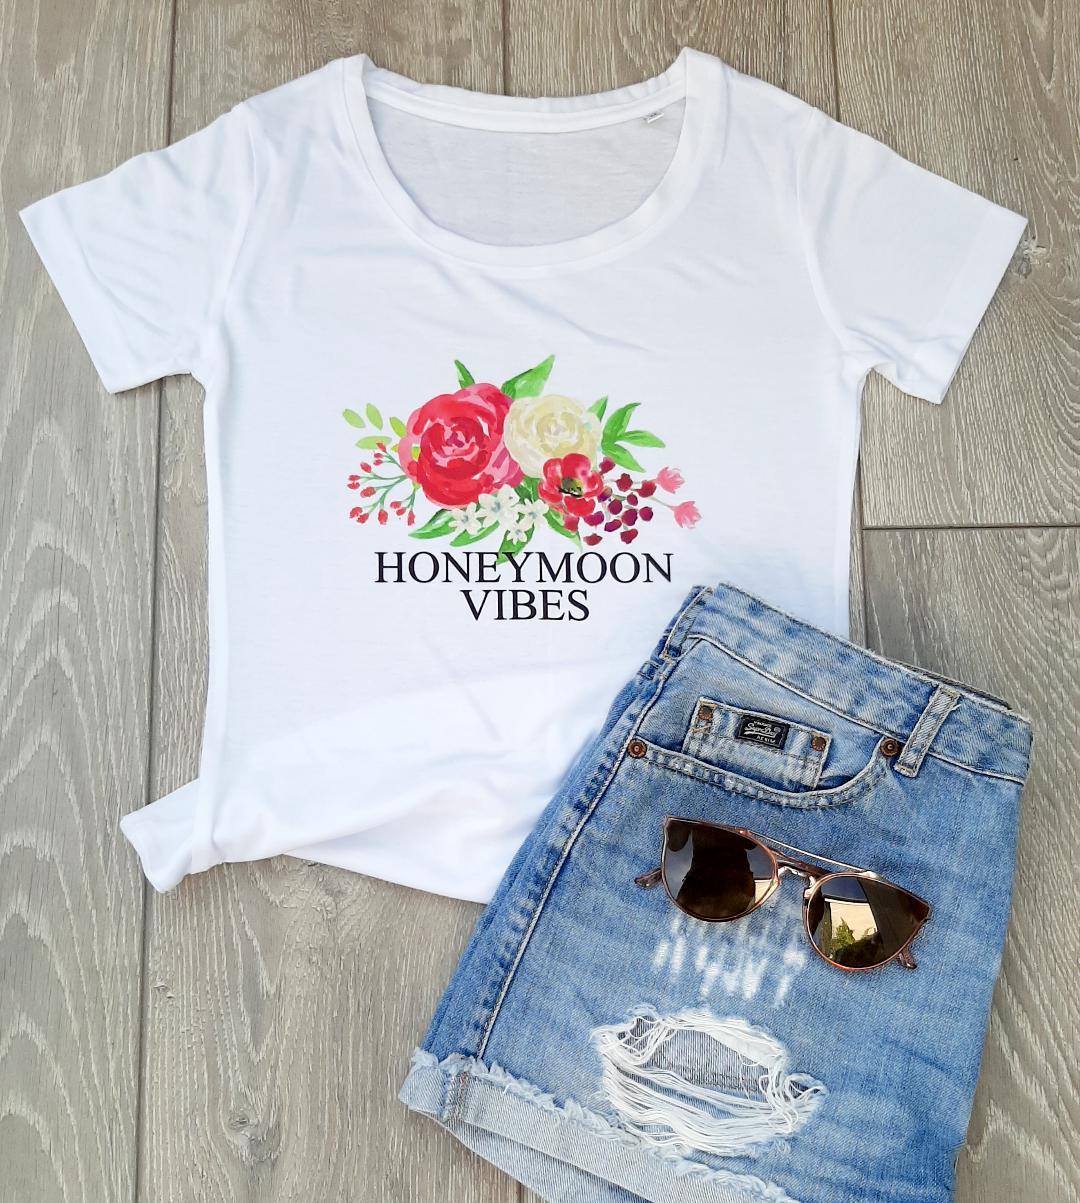 honeymoon vibes t shirt